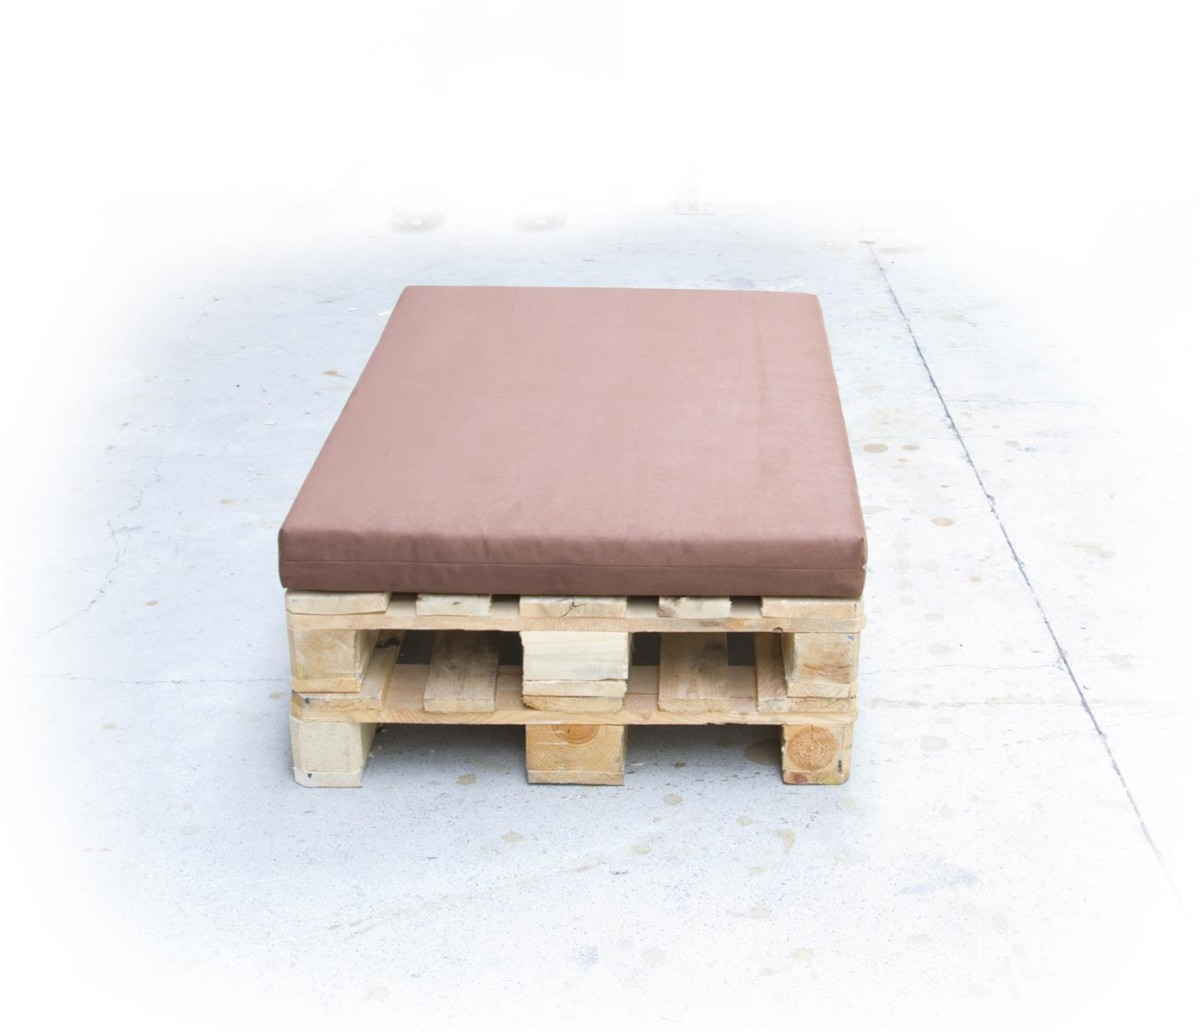 palettenpolster f r lounge sofam bel schaumstoff rg 35 sitzpolst 32 90. Black Bedroom Furniture Sets. Home Design Ideas